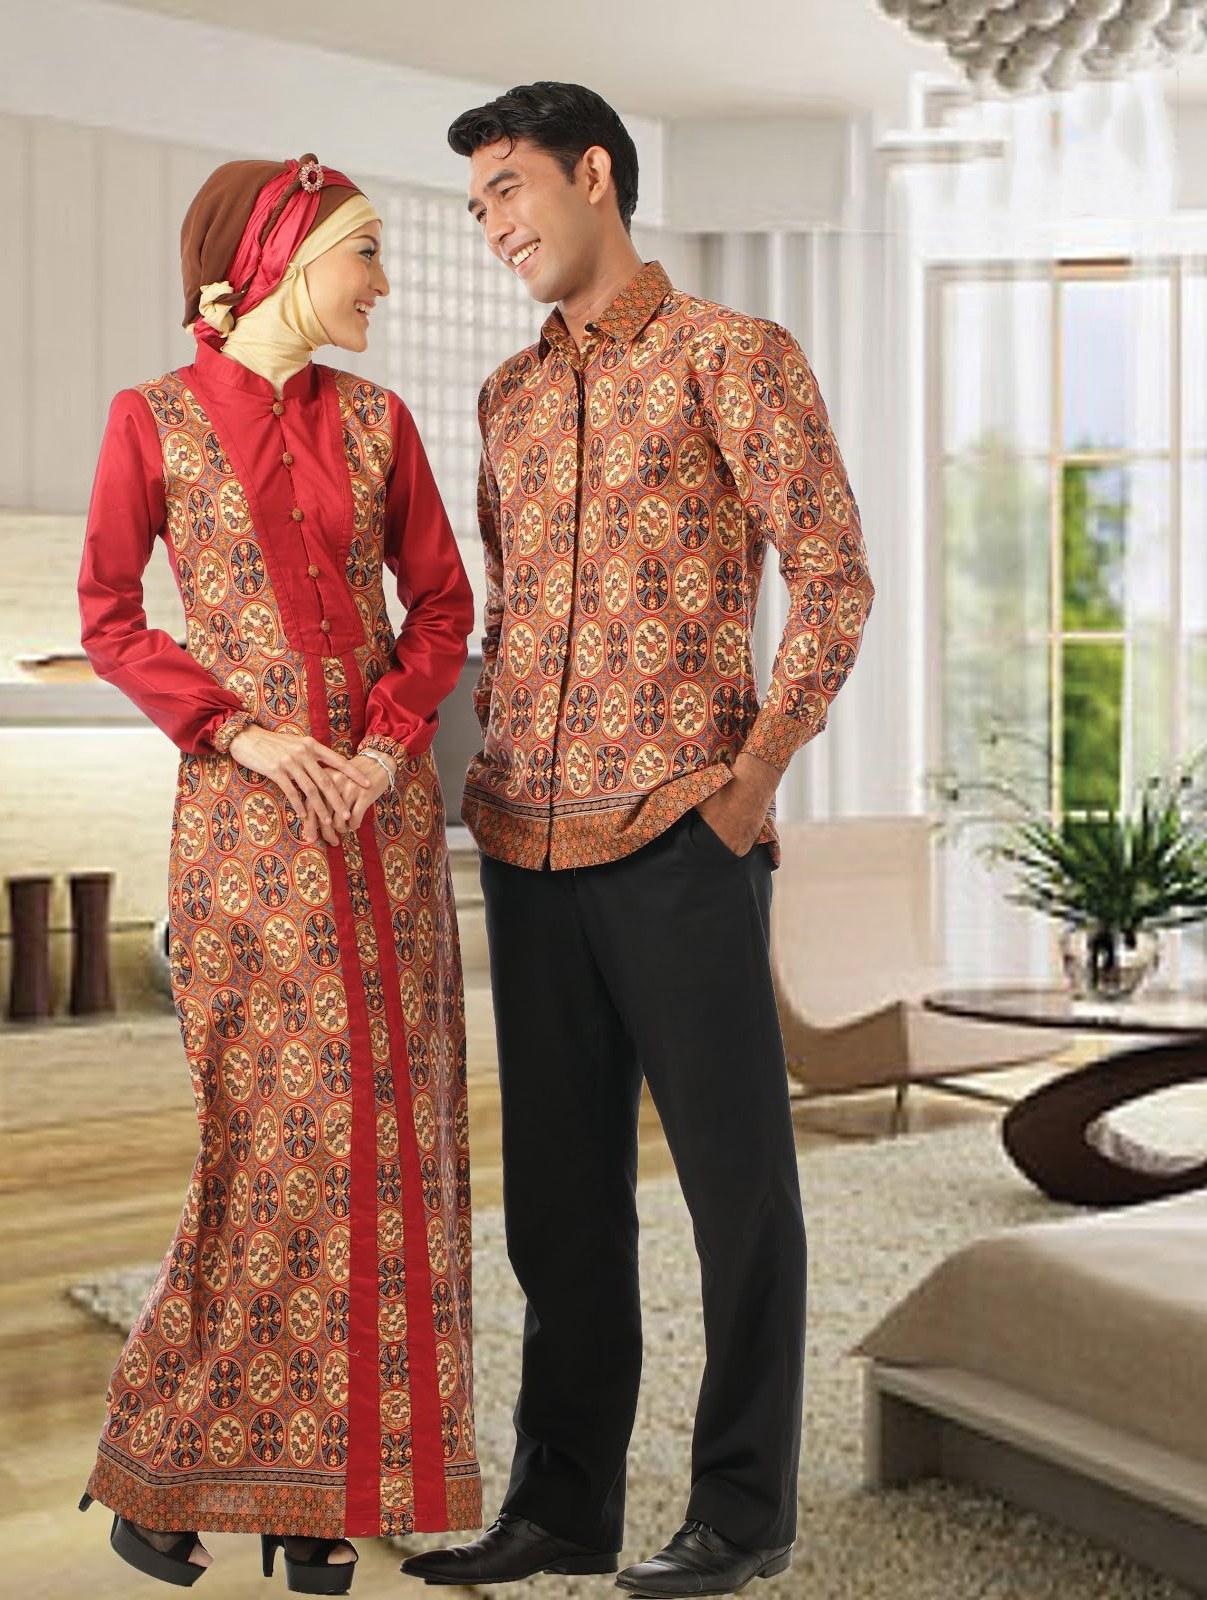 Model Model Baru Baju Lebaran 3id6 Trend Model Baju Batik Lebaran Terbaru 2013